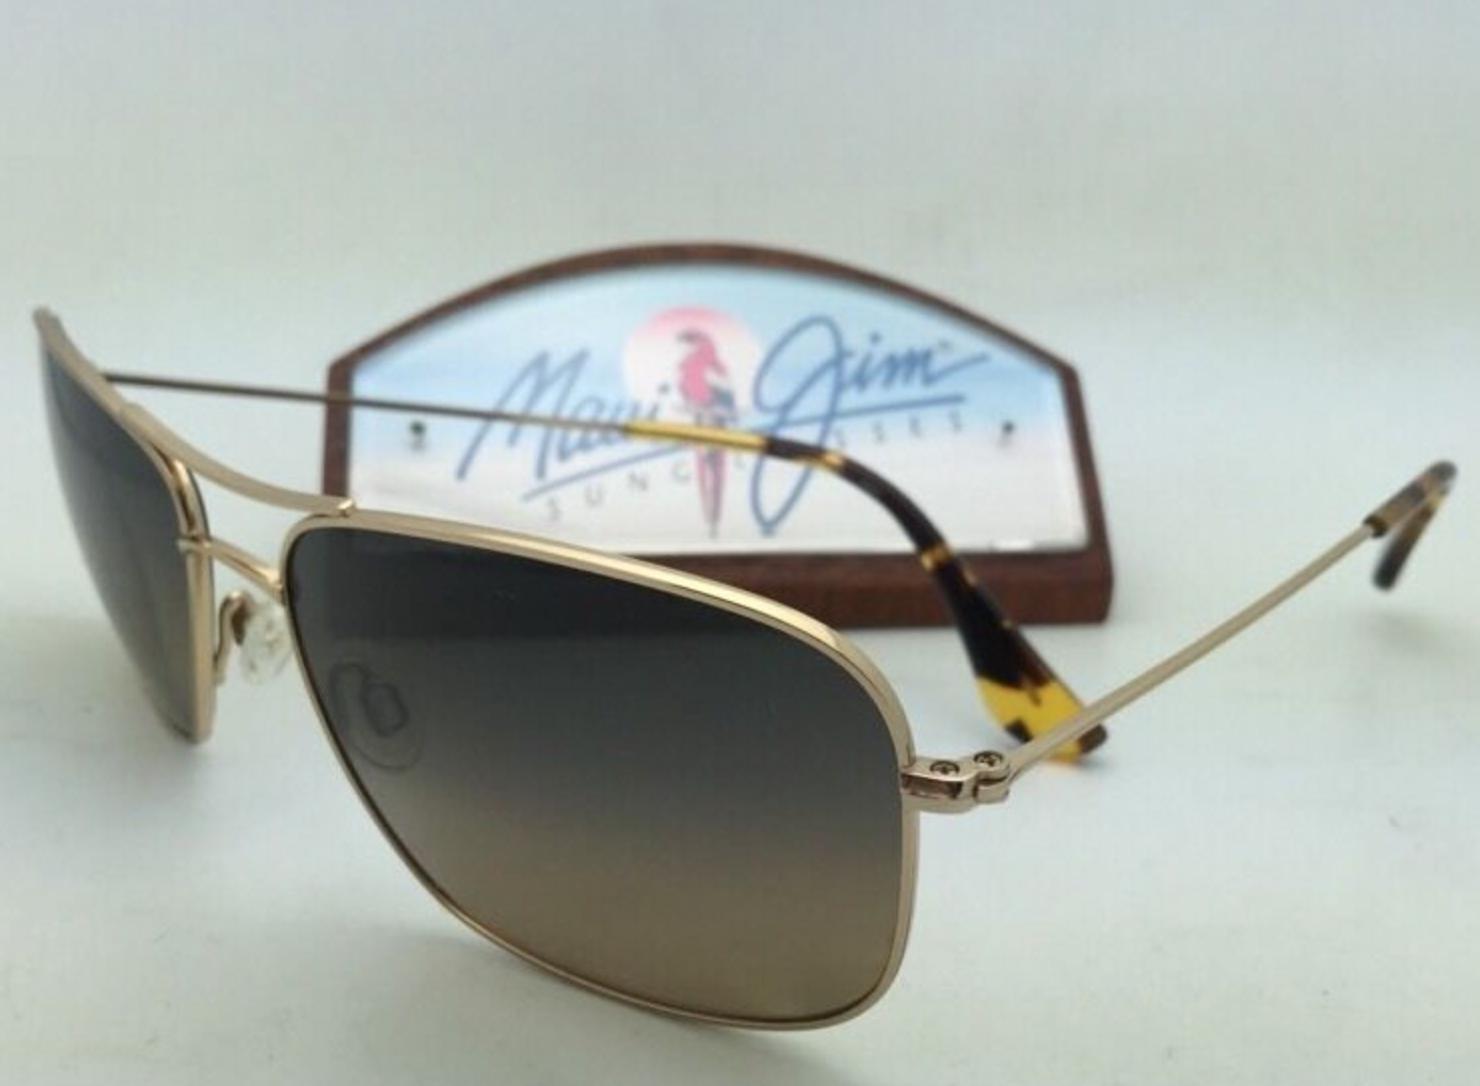 Polarized MAUI JIM Sunglasses Titanium WIKI WIKI MJ 246-16 Gold Frame Brown Lens